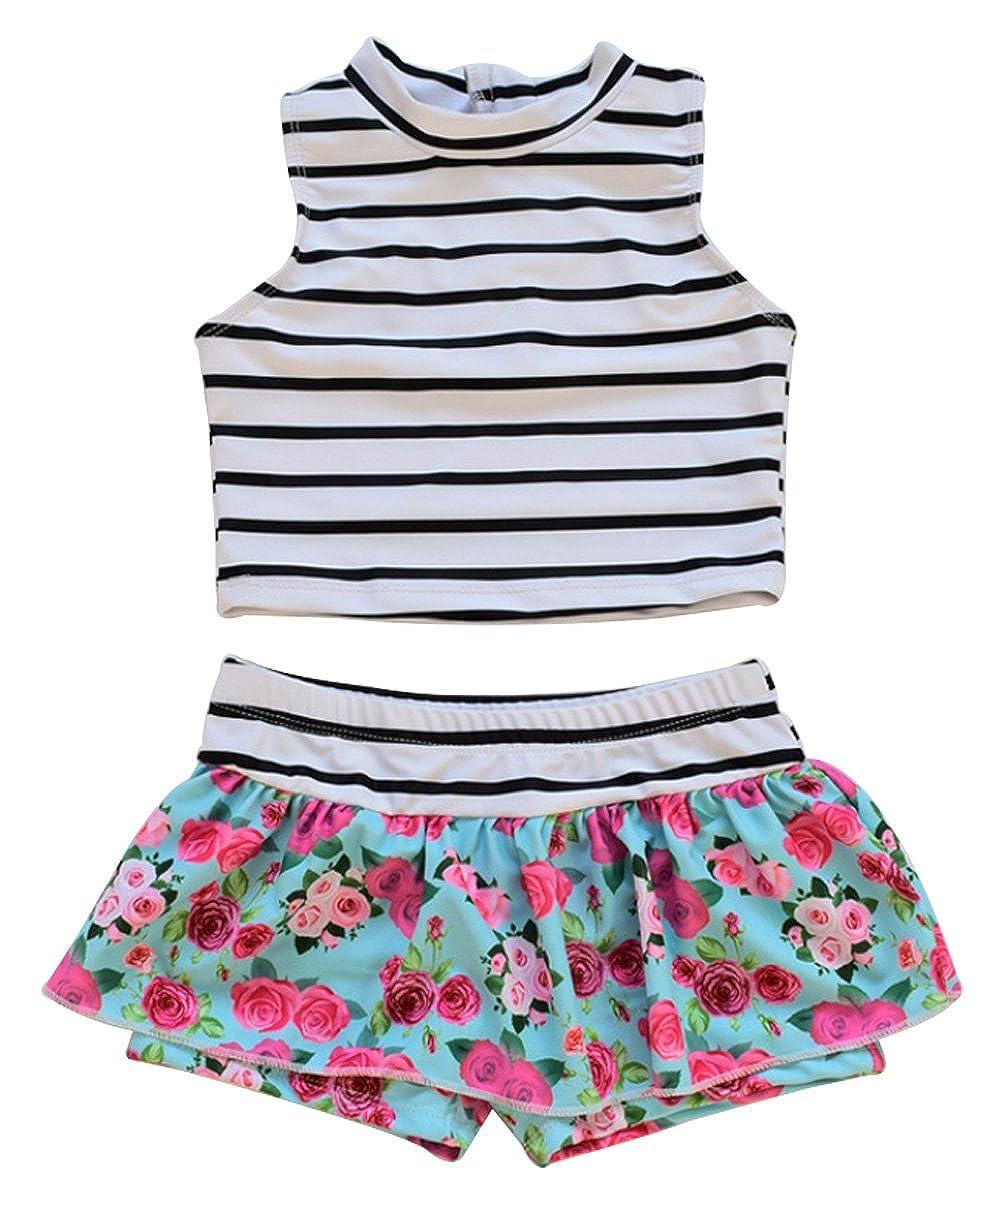 Baby Girls Two Piece Floral Tankini Swimsuit Beach Swimwear UNIQUEONE